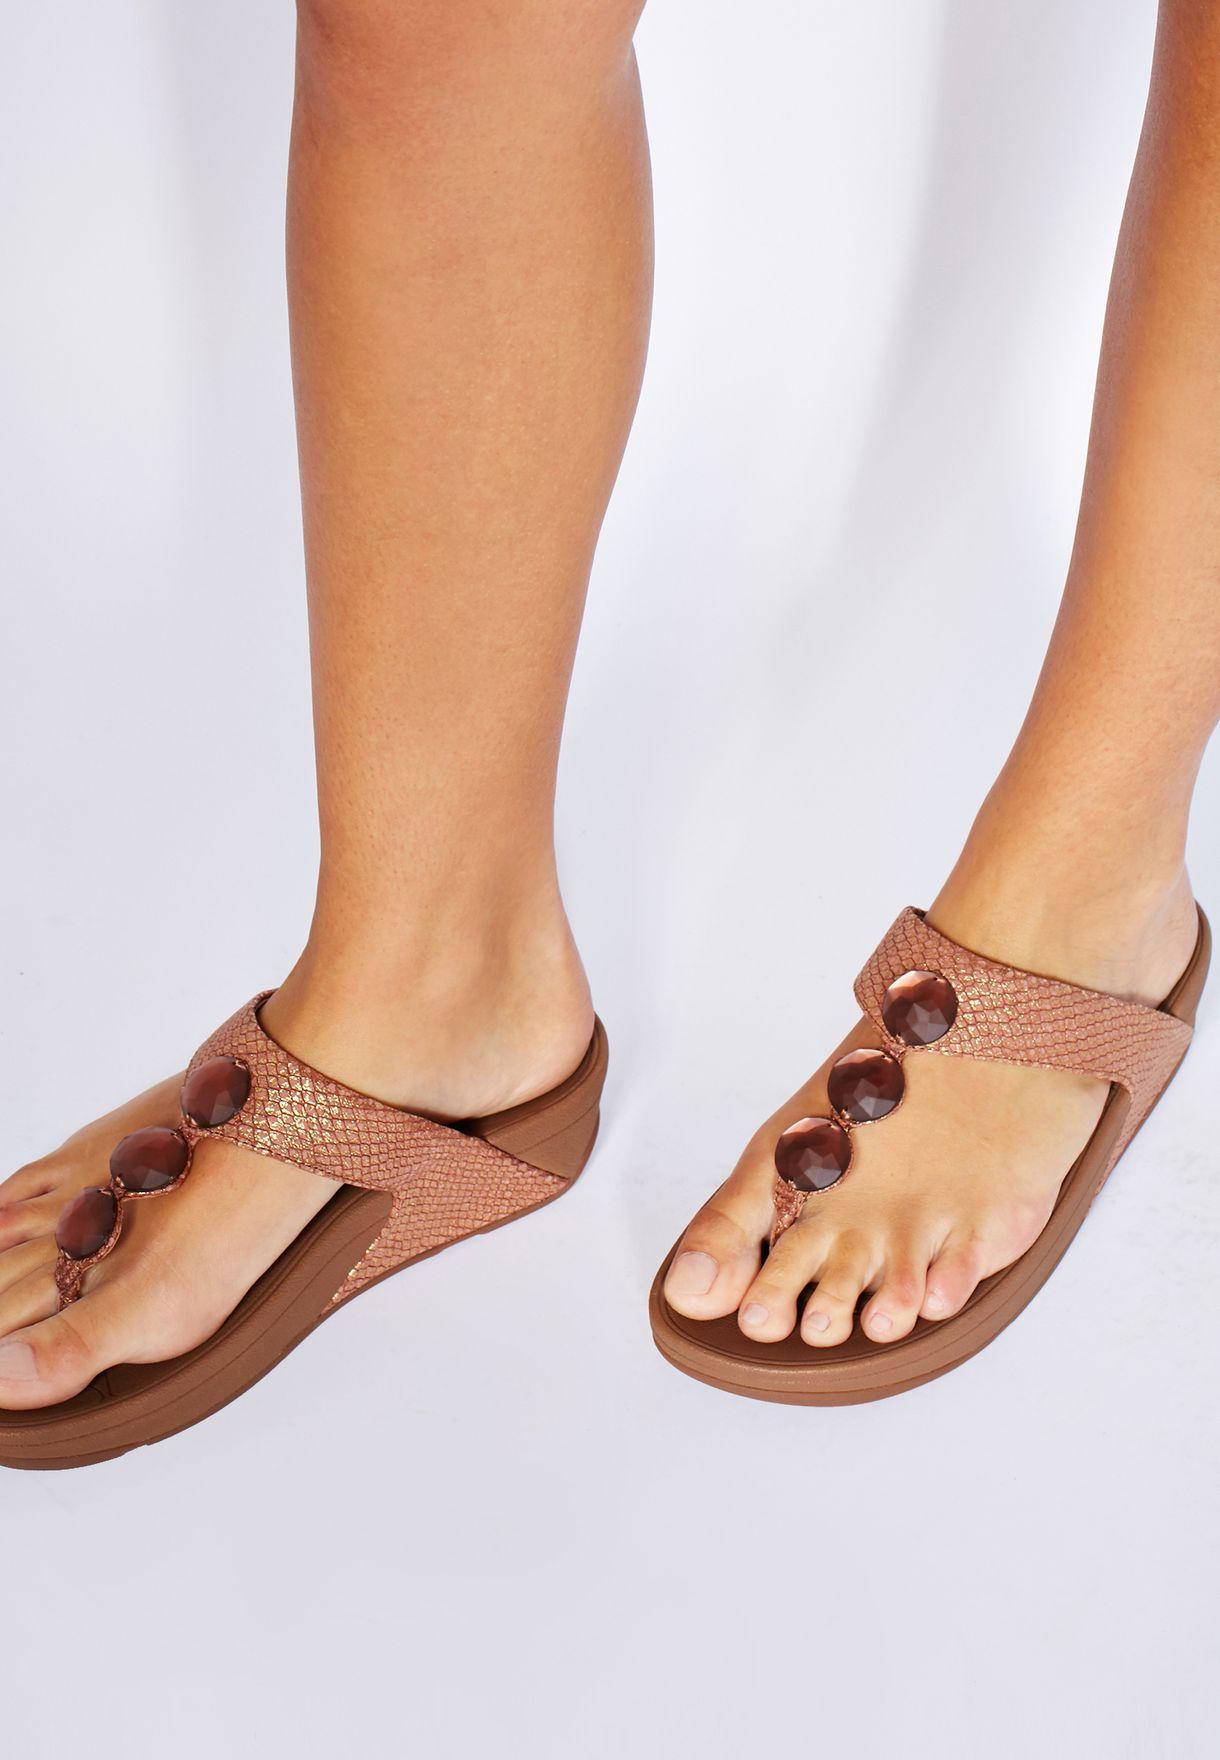 70e3ca8305992c Shop Fitflop bronze Petra Sandals 476-295 for Women in Saudi ...